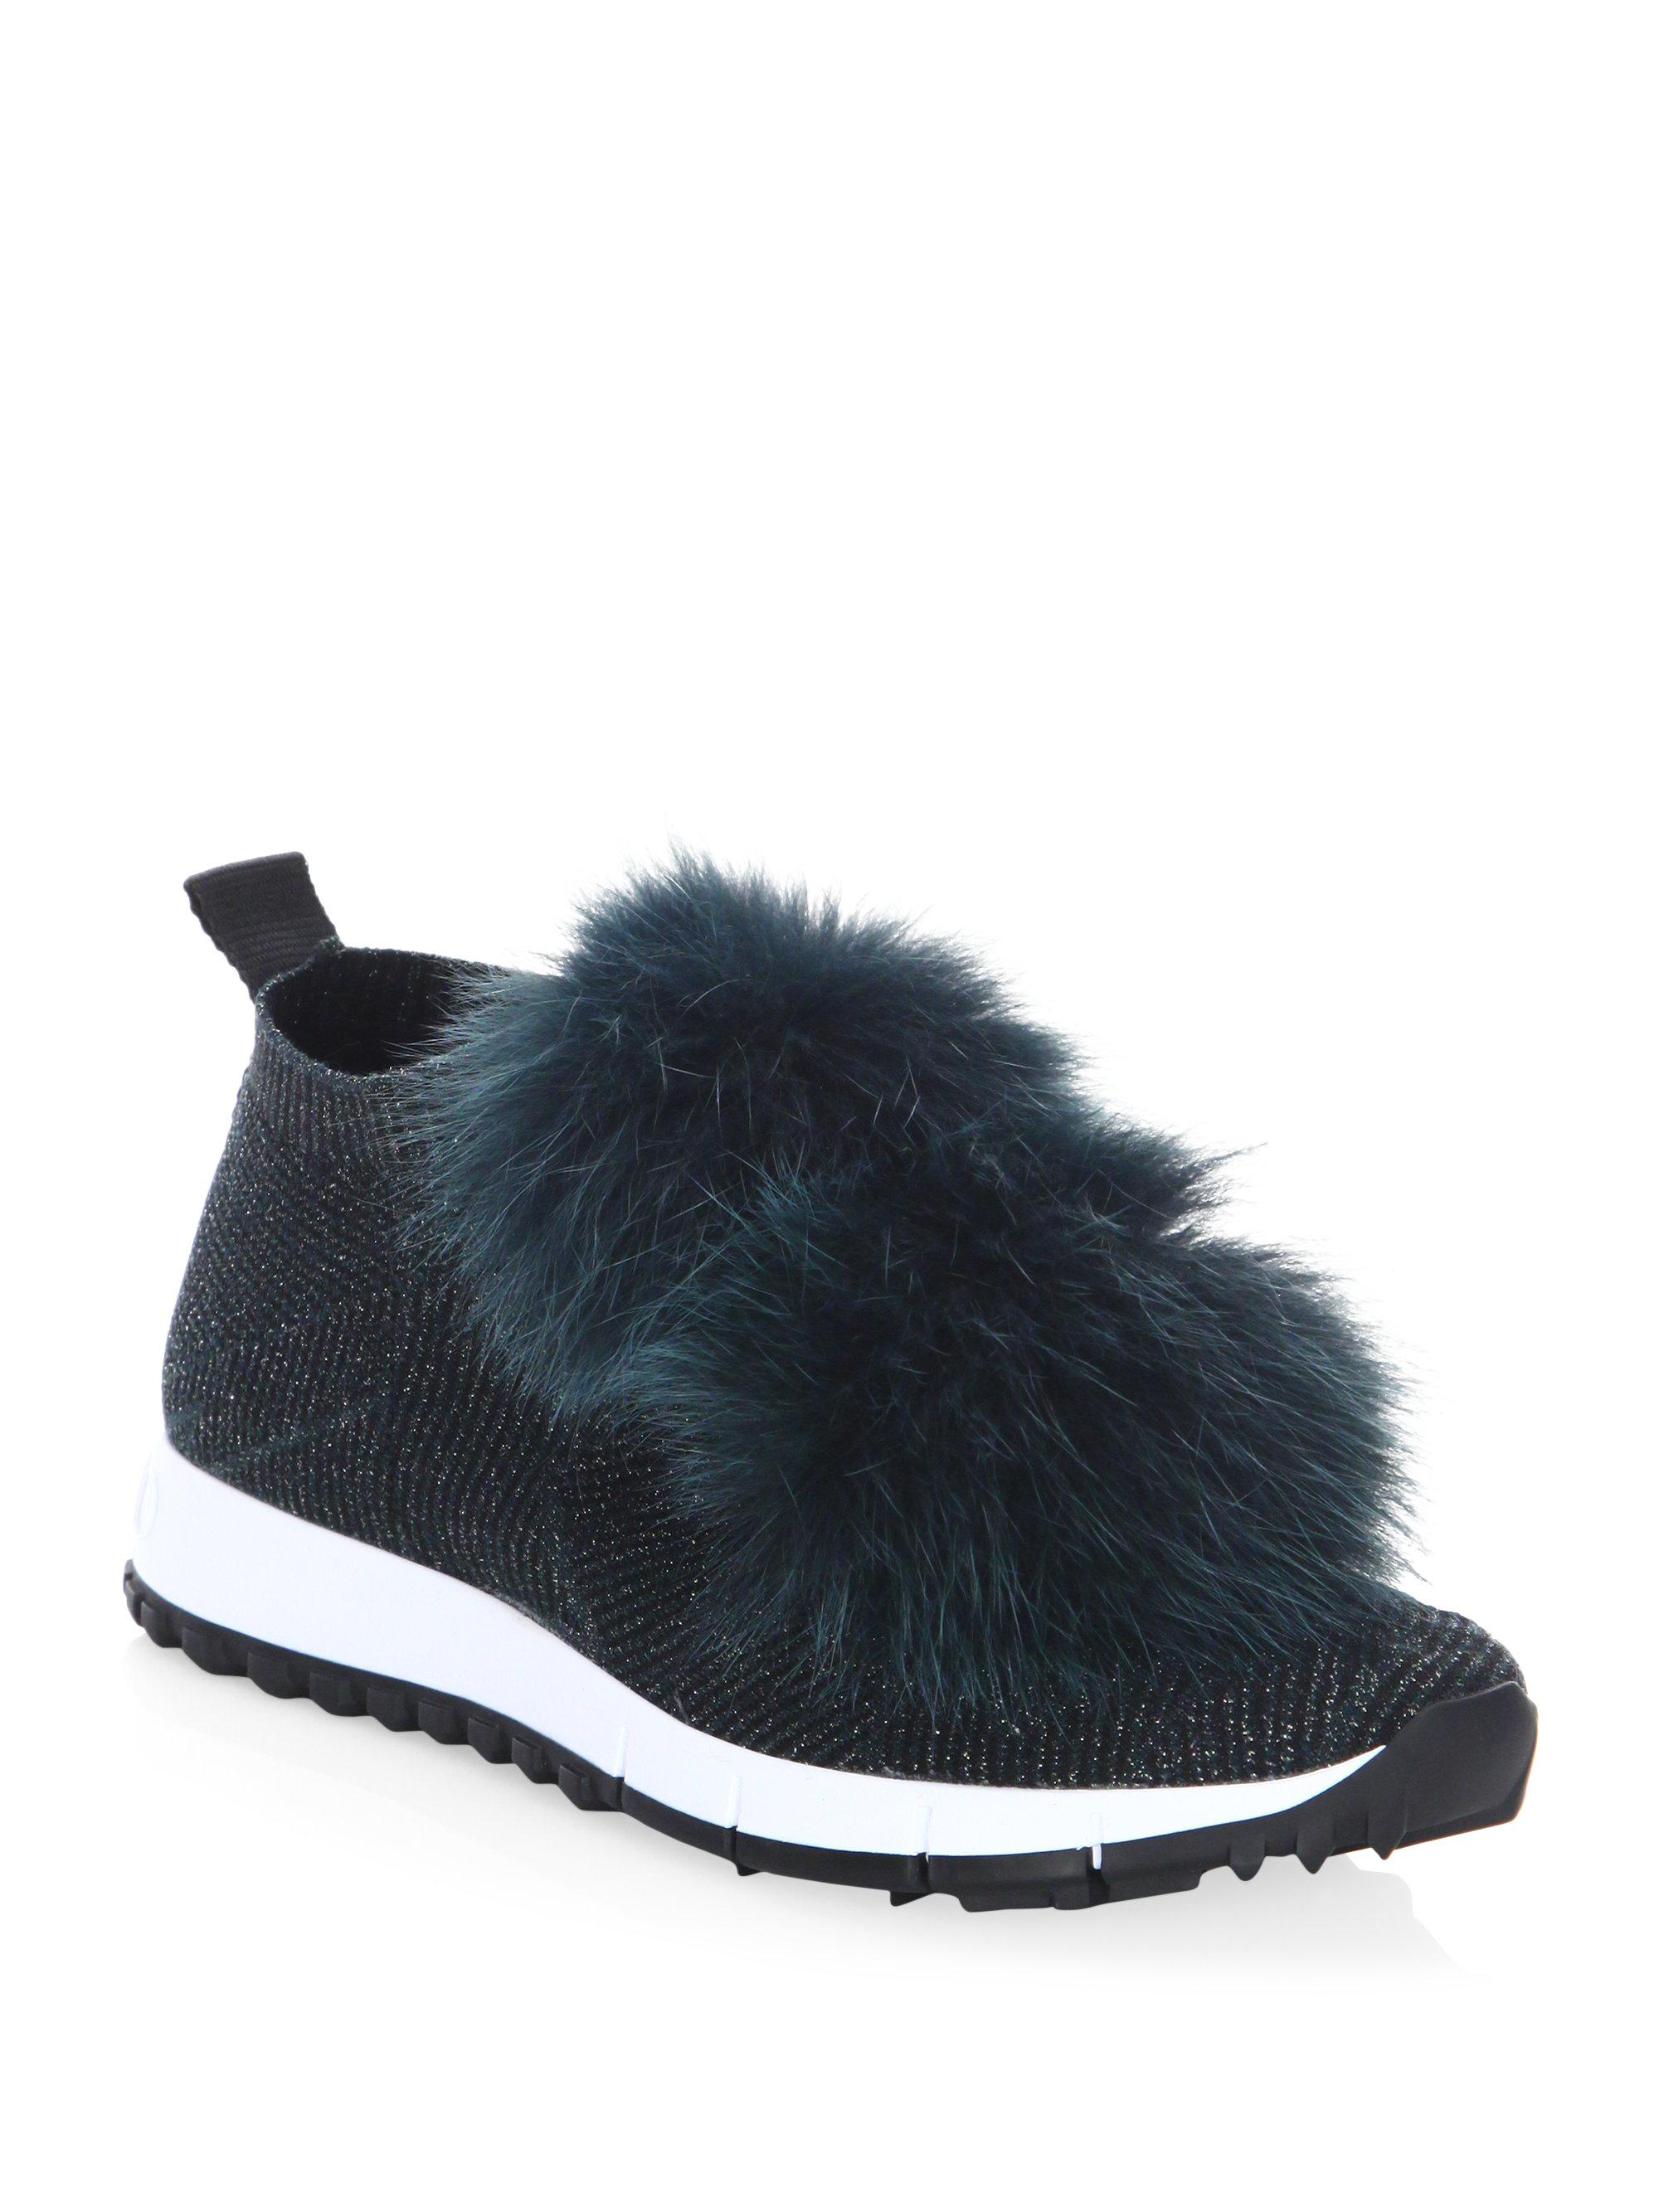 Jimmy choo Norway Fur Pom-Pom & Lurex Sneakers rpF841lE